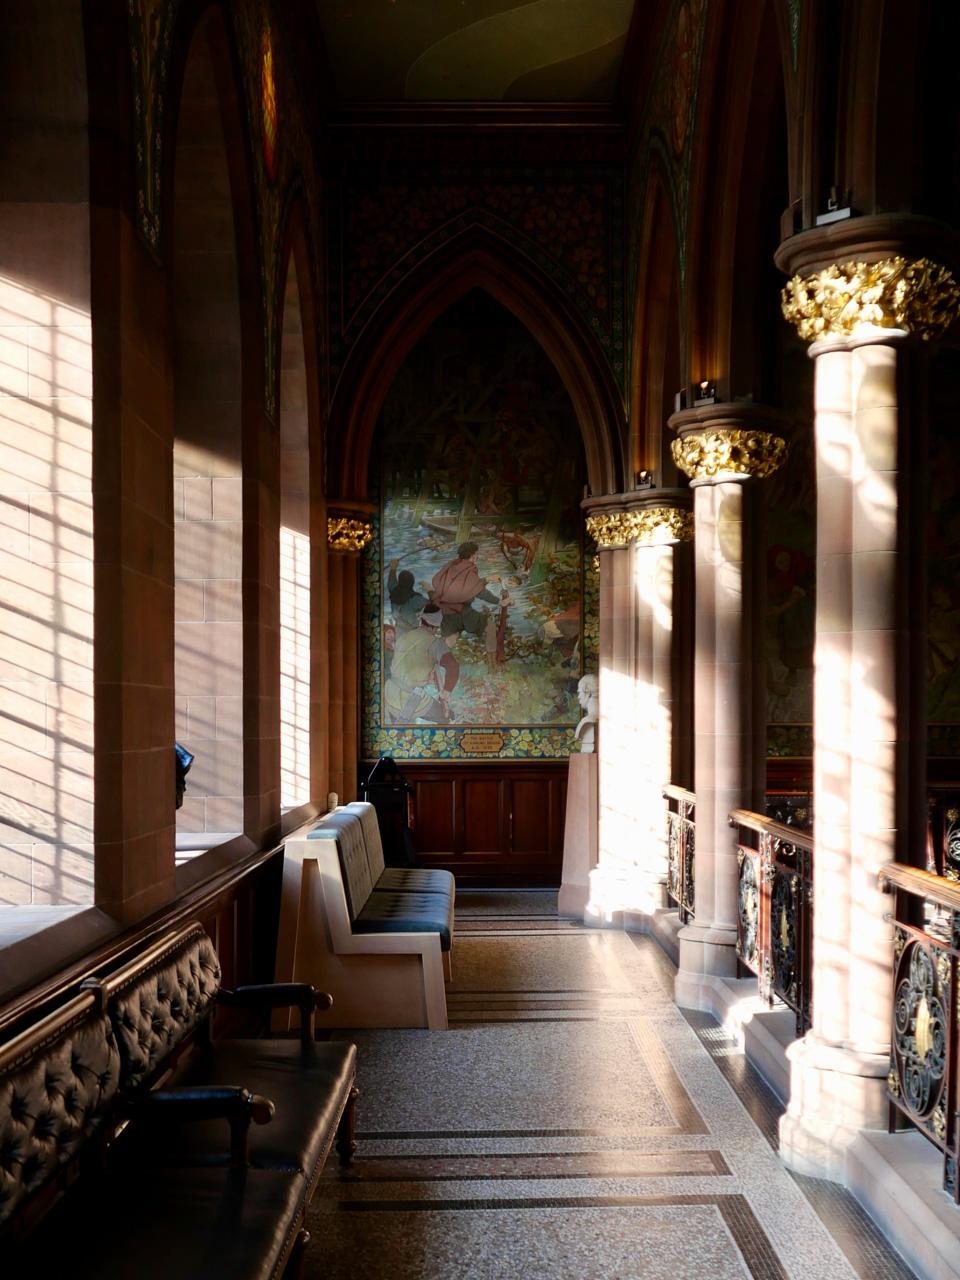 ara Sharratt Travel - Scottish National Portrait Gallery - Edinburgh, United Kingdom